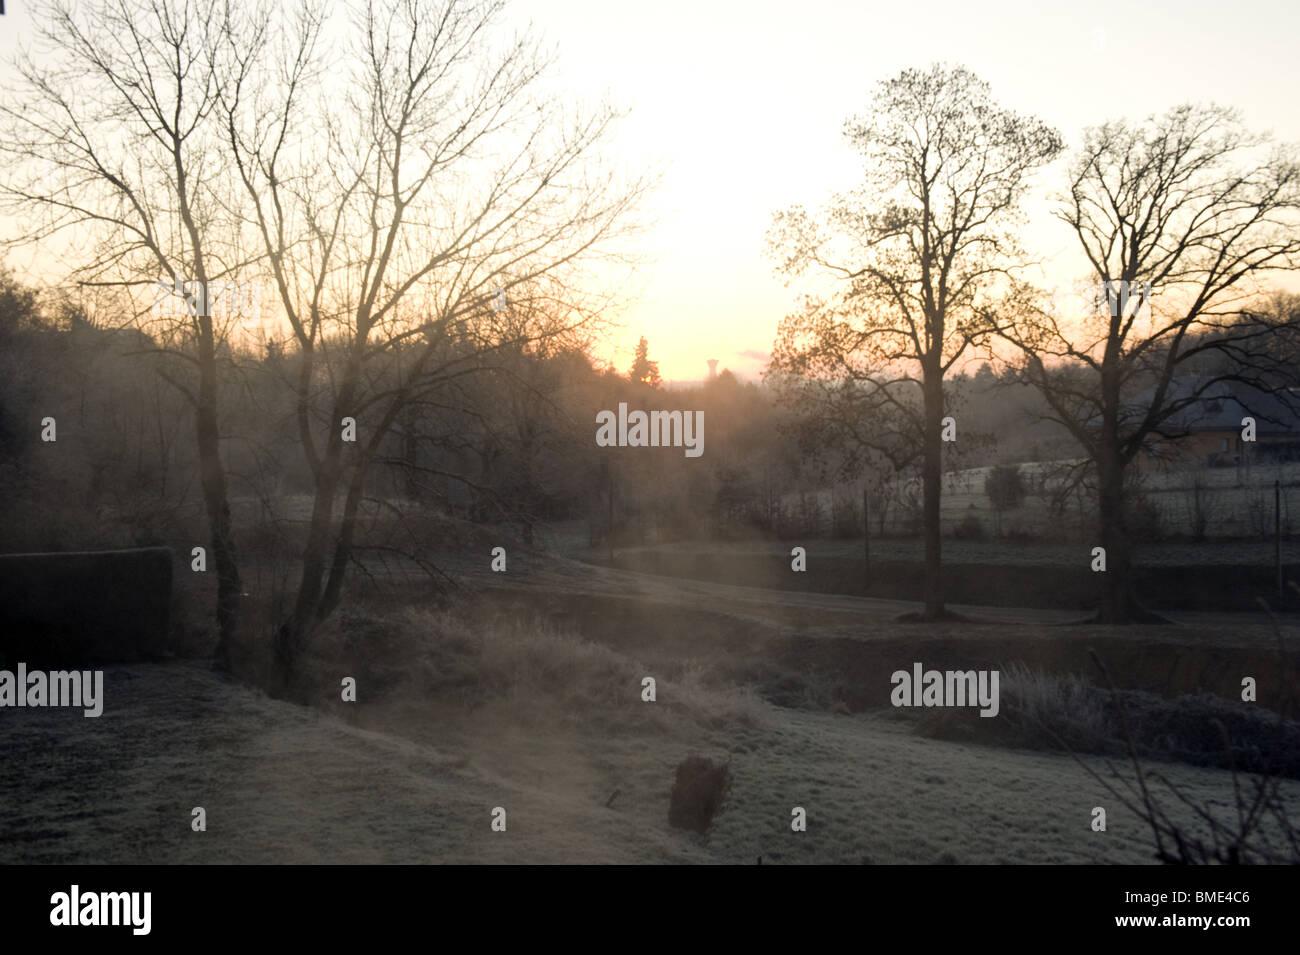 paysage de campagne, brouillard, aube, countryside, fog, dawn - Stock Image